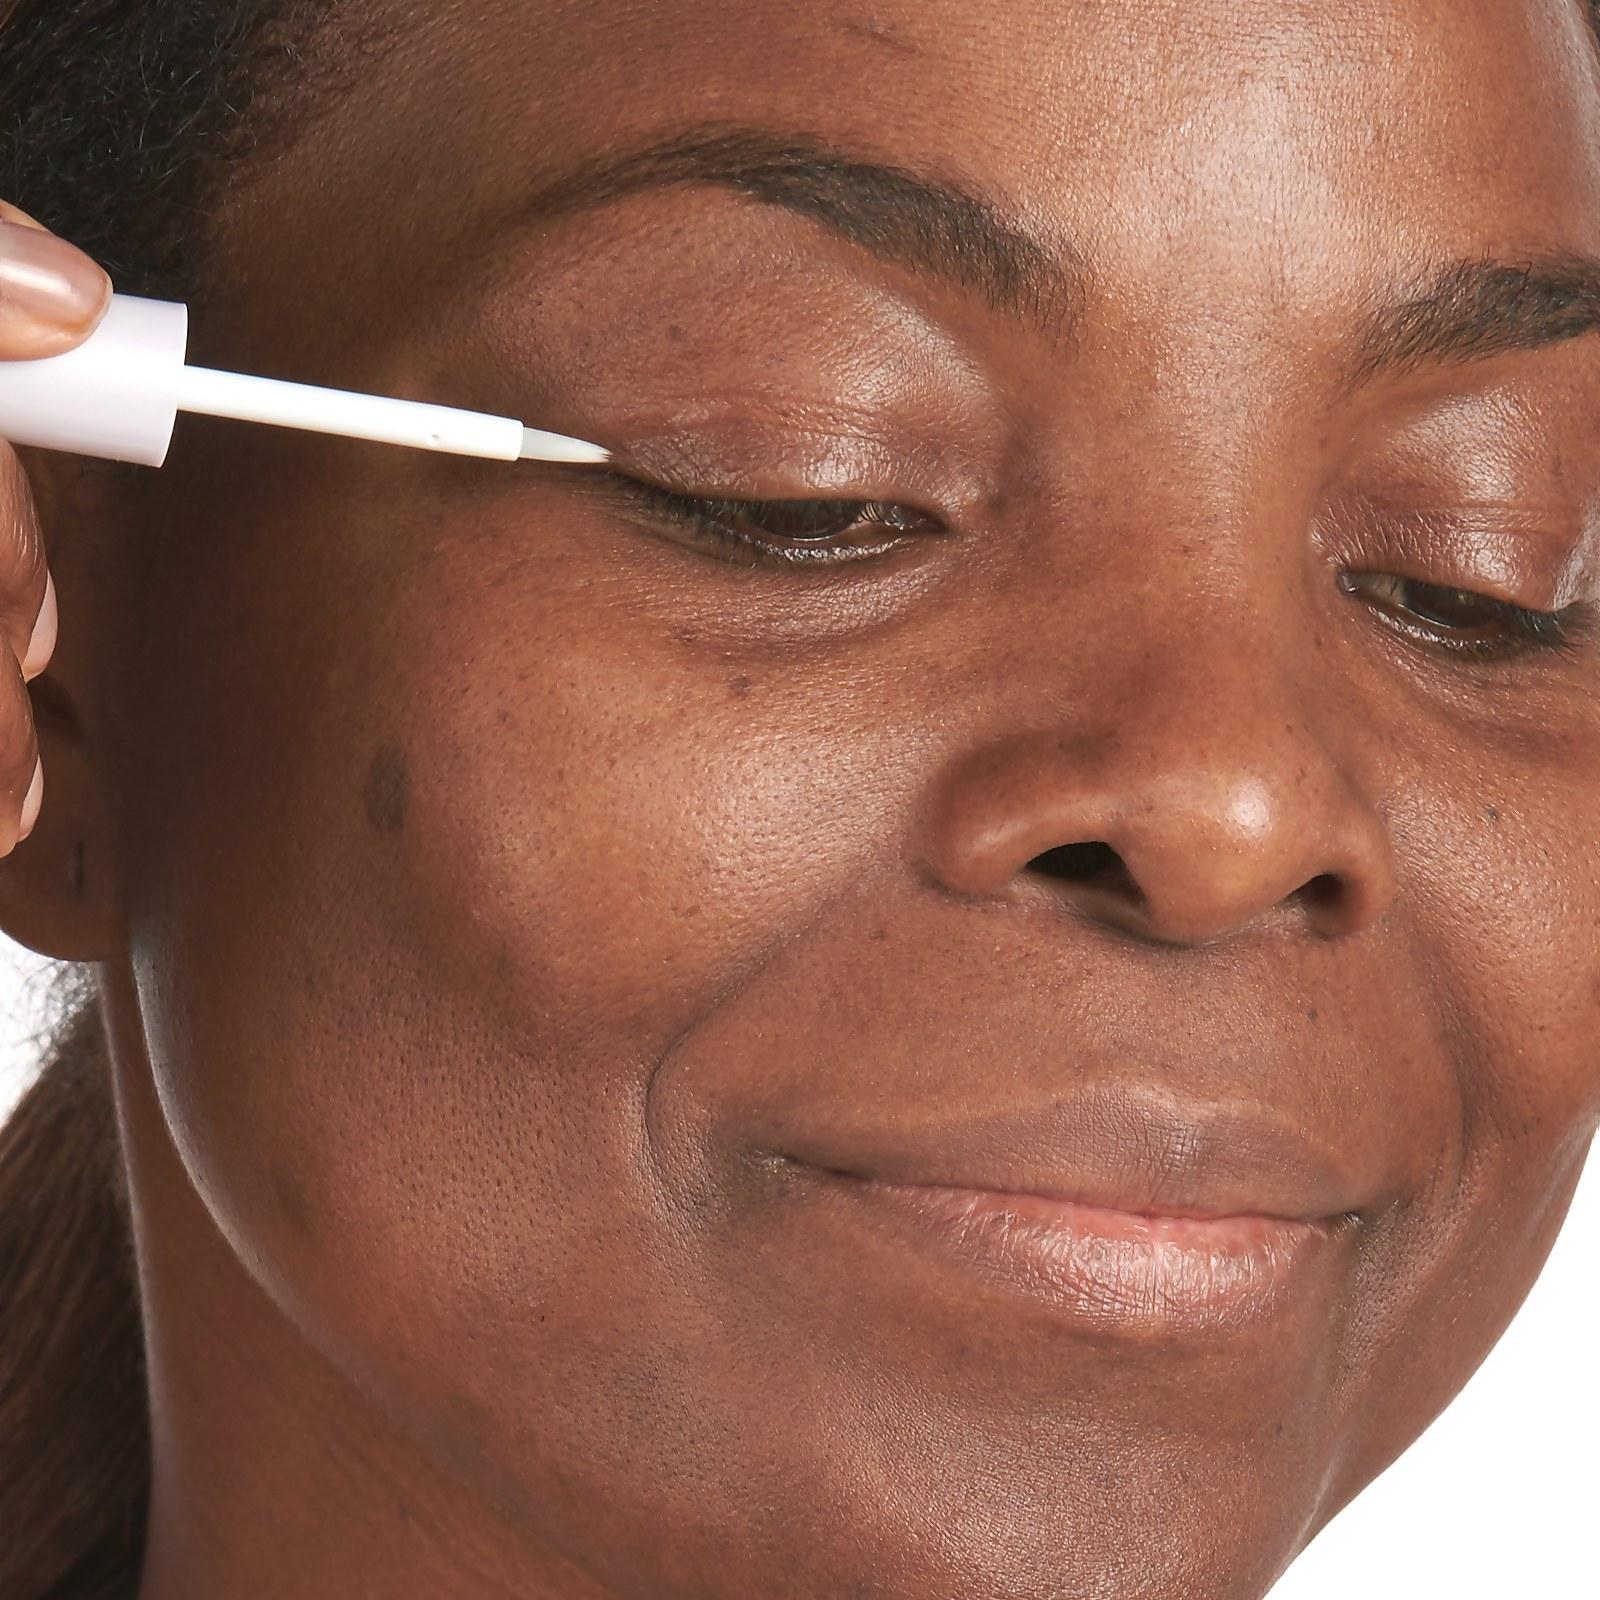 model applying the lash serum